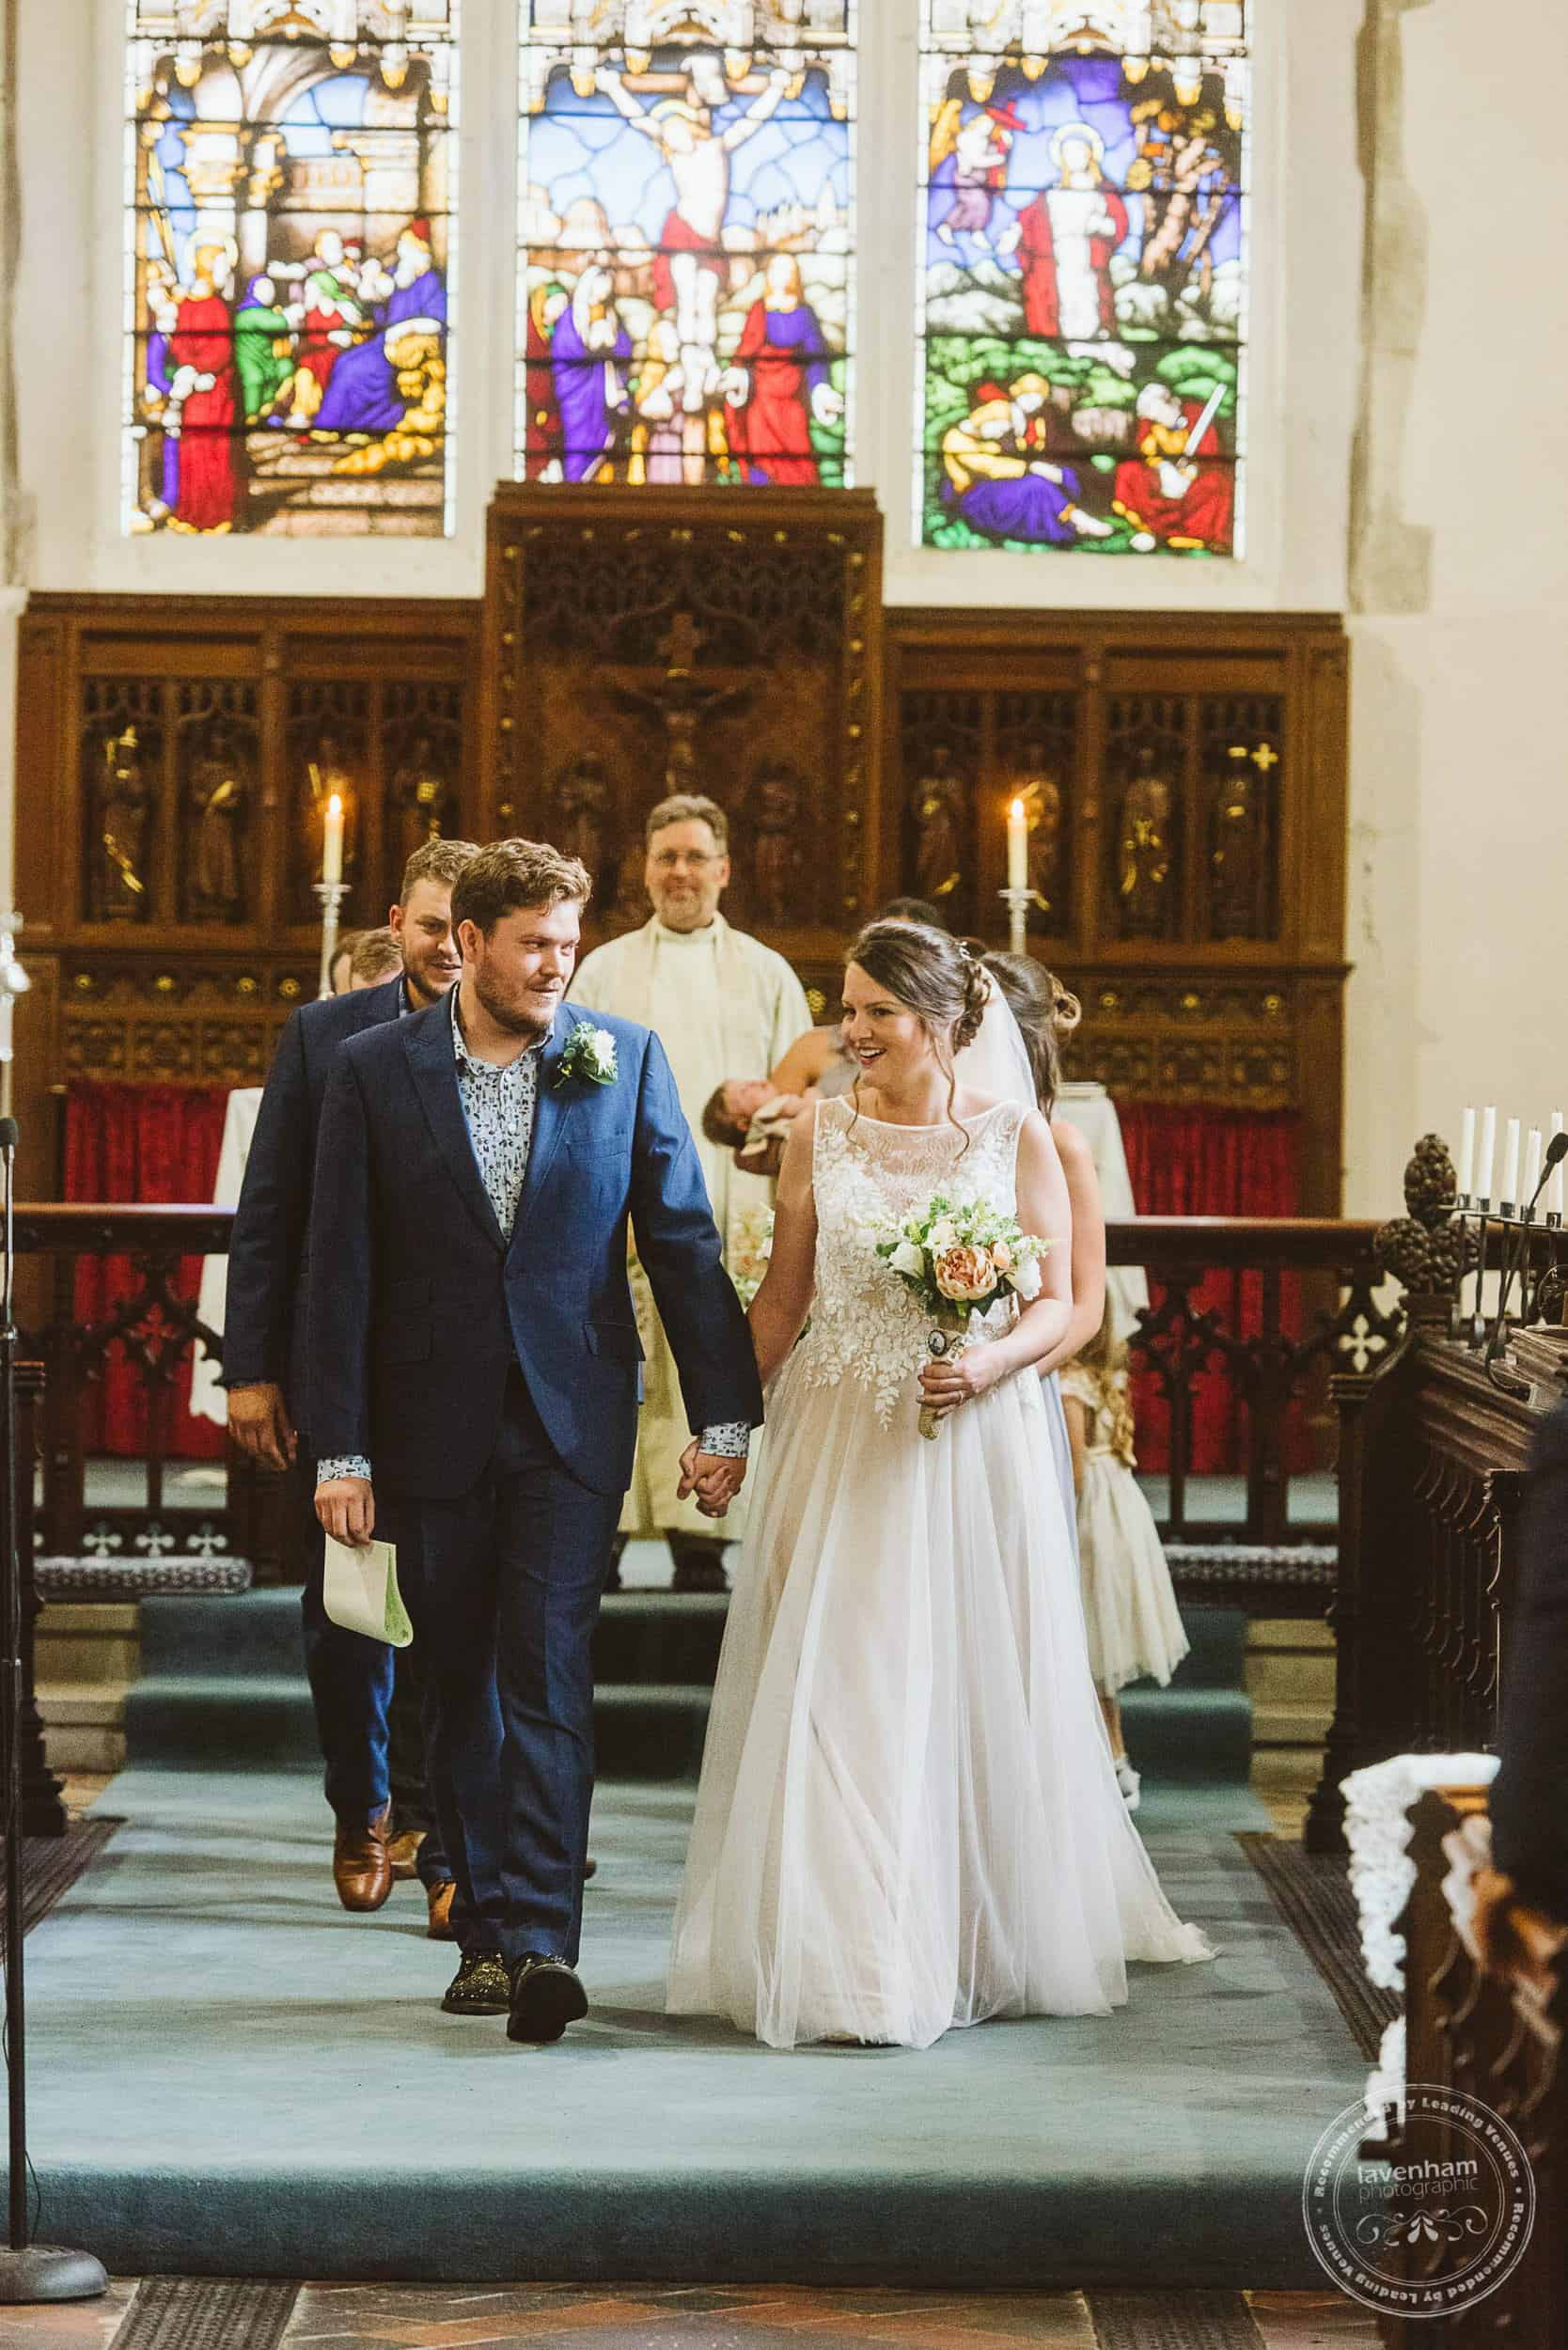 180818 Marks Hall Wedding Photography Lavenham Photographic 064